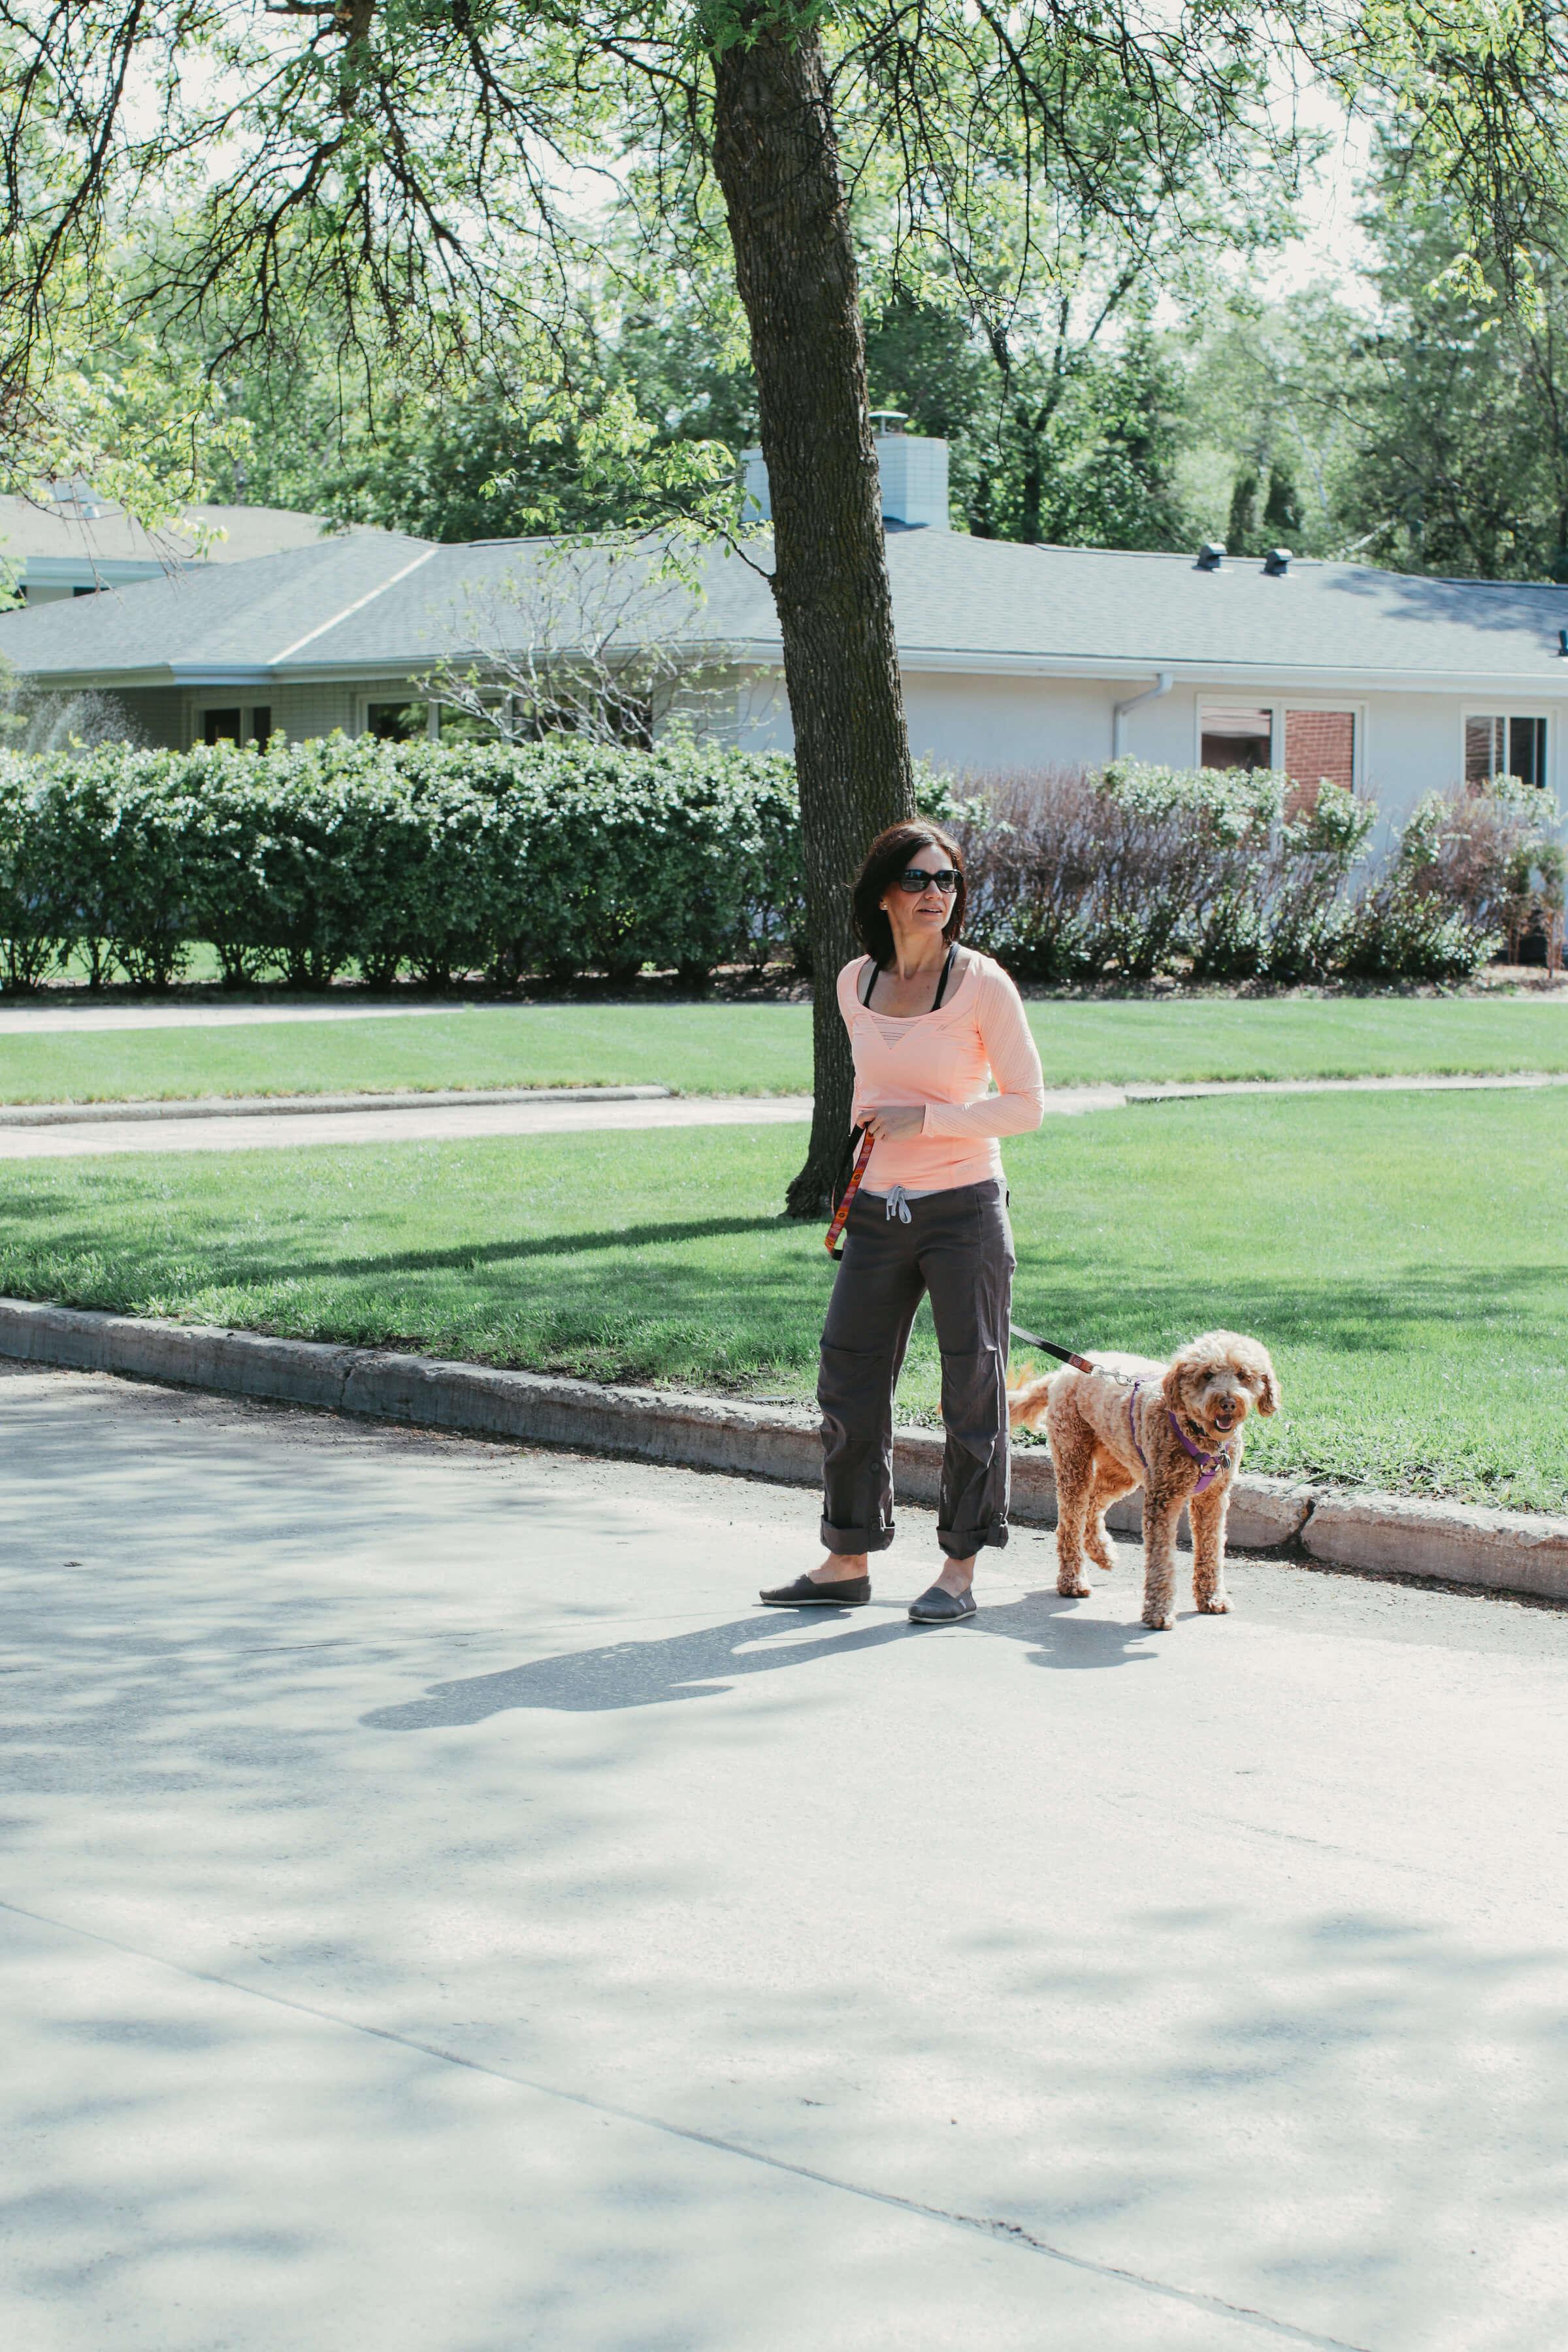 Taking dog for a walk